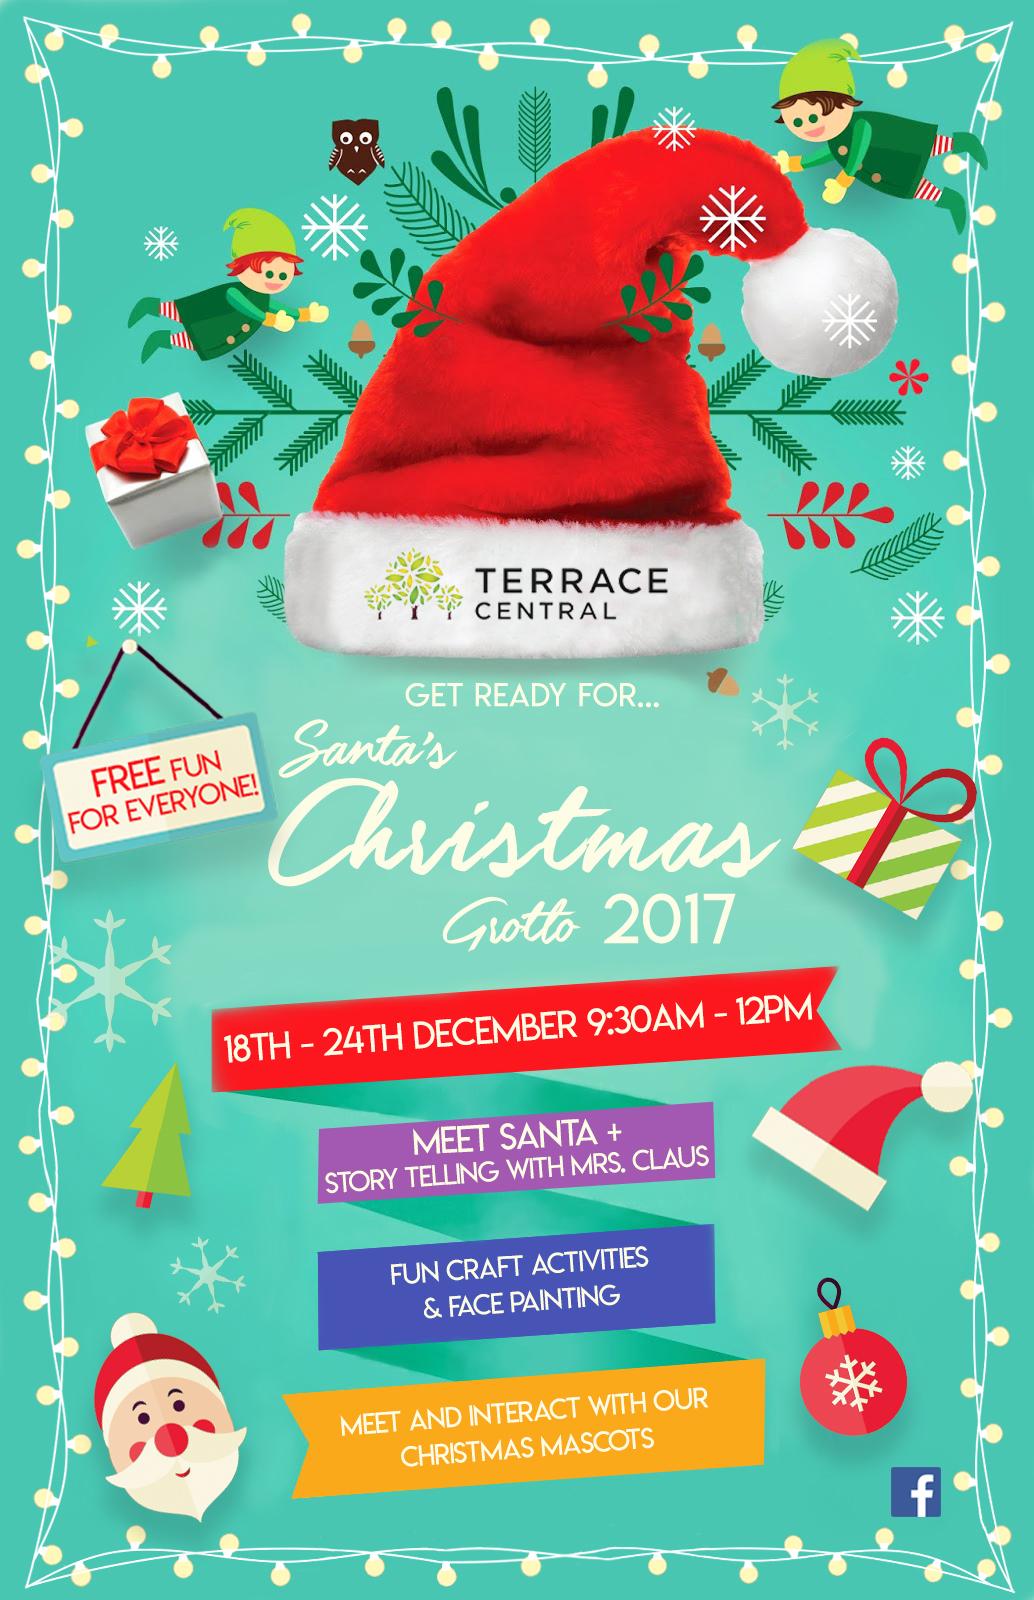 Final-RTC Christmas poster 2017.jpg